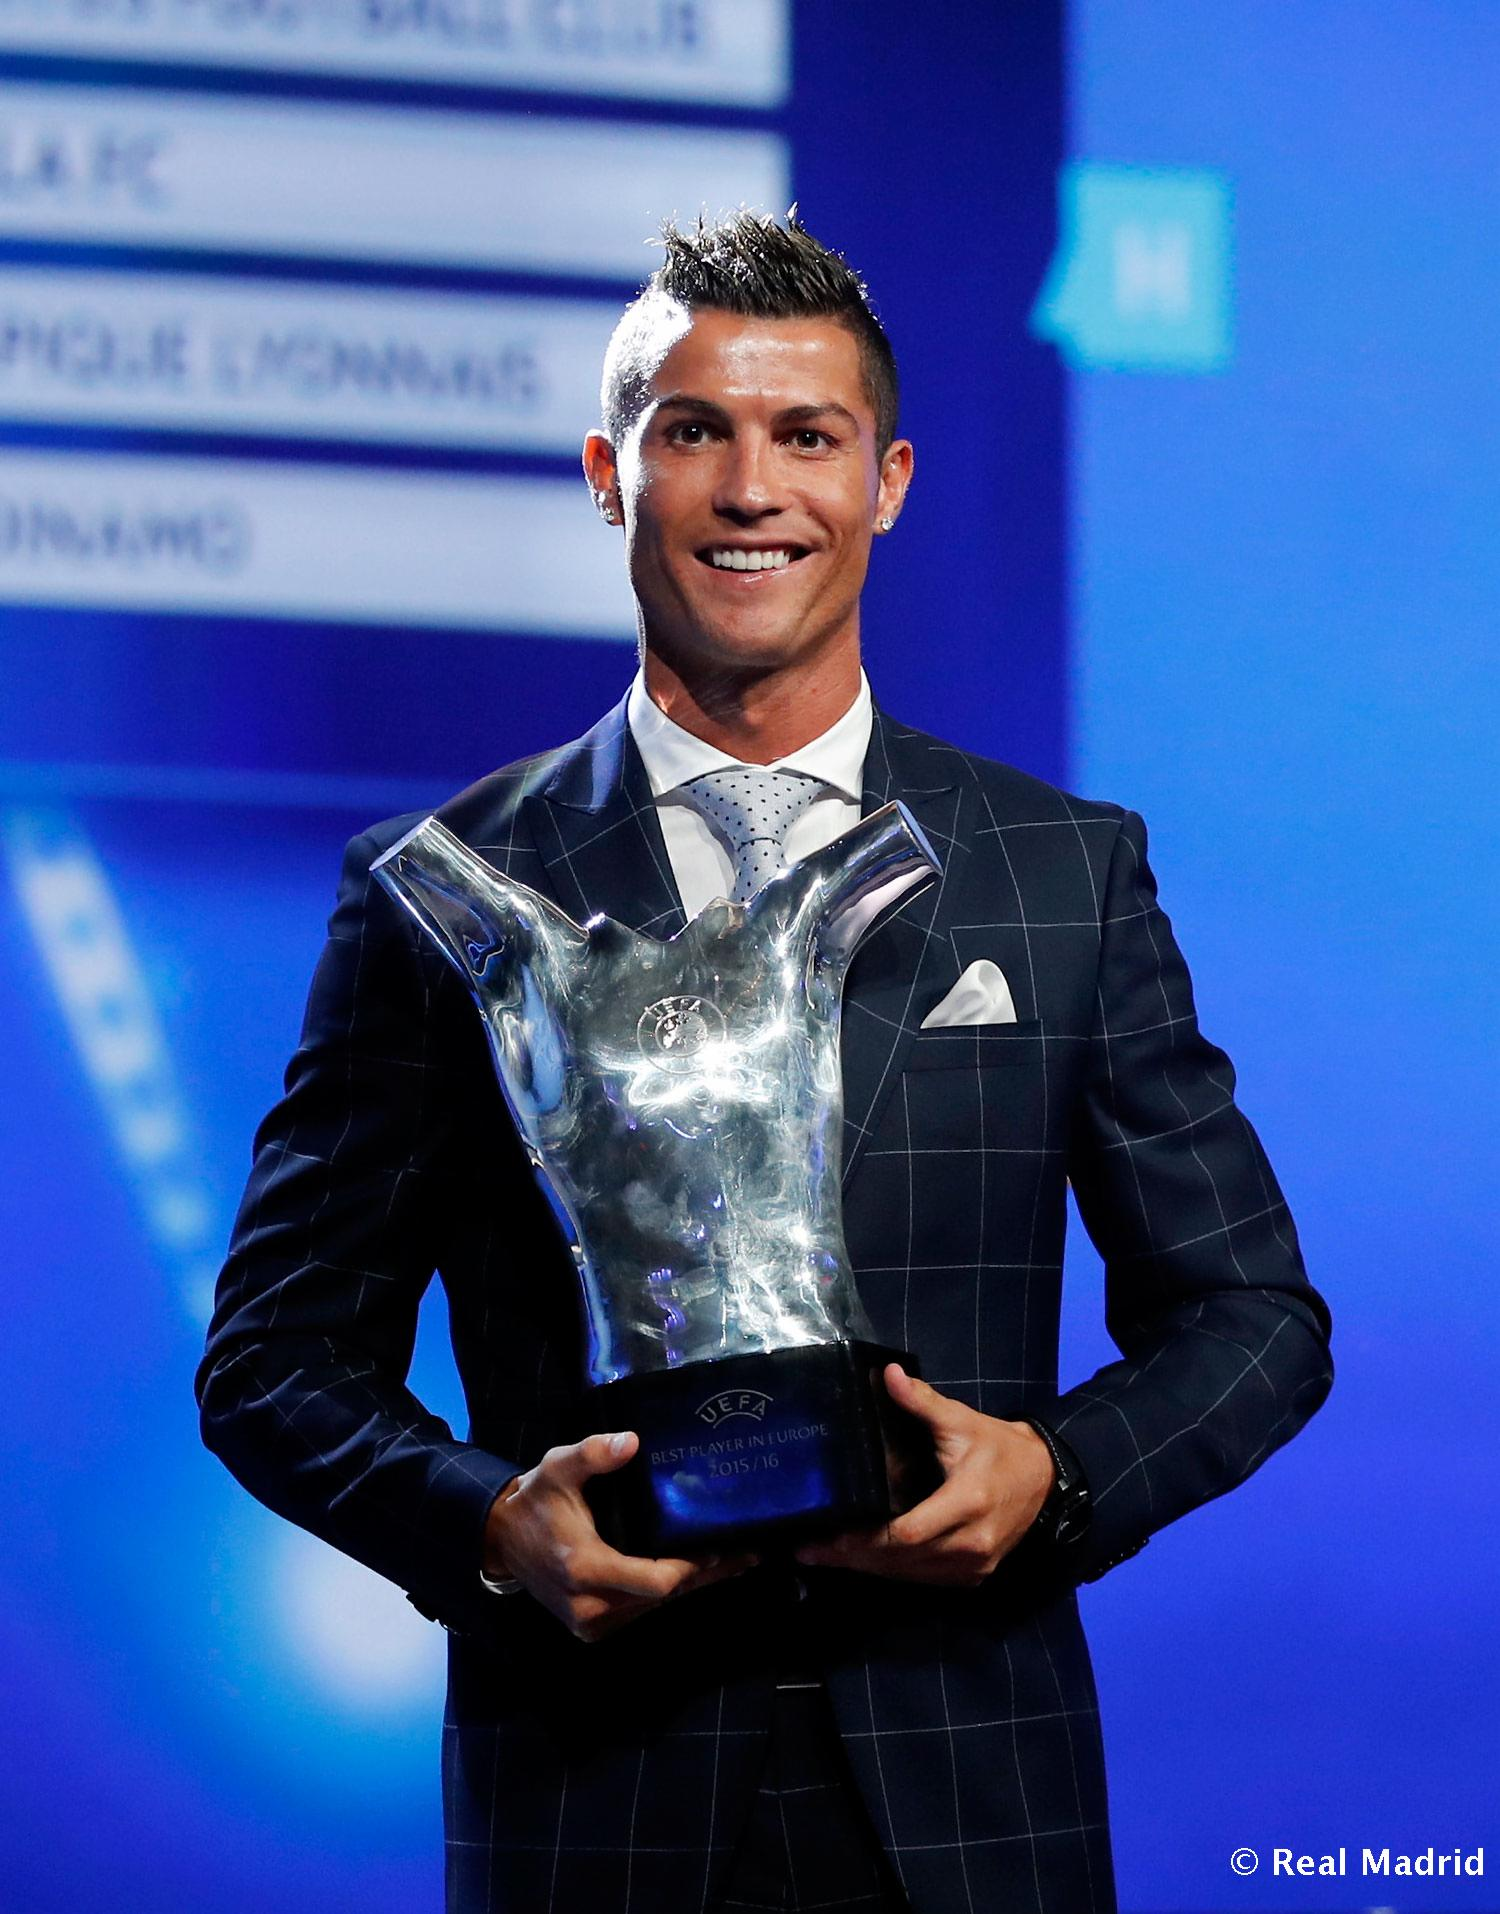 صوره صور كرستيانو رونالدو 2019 , افضل لاعب اوروبي